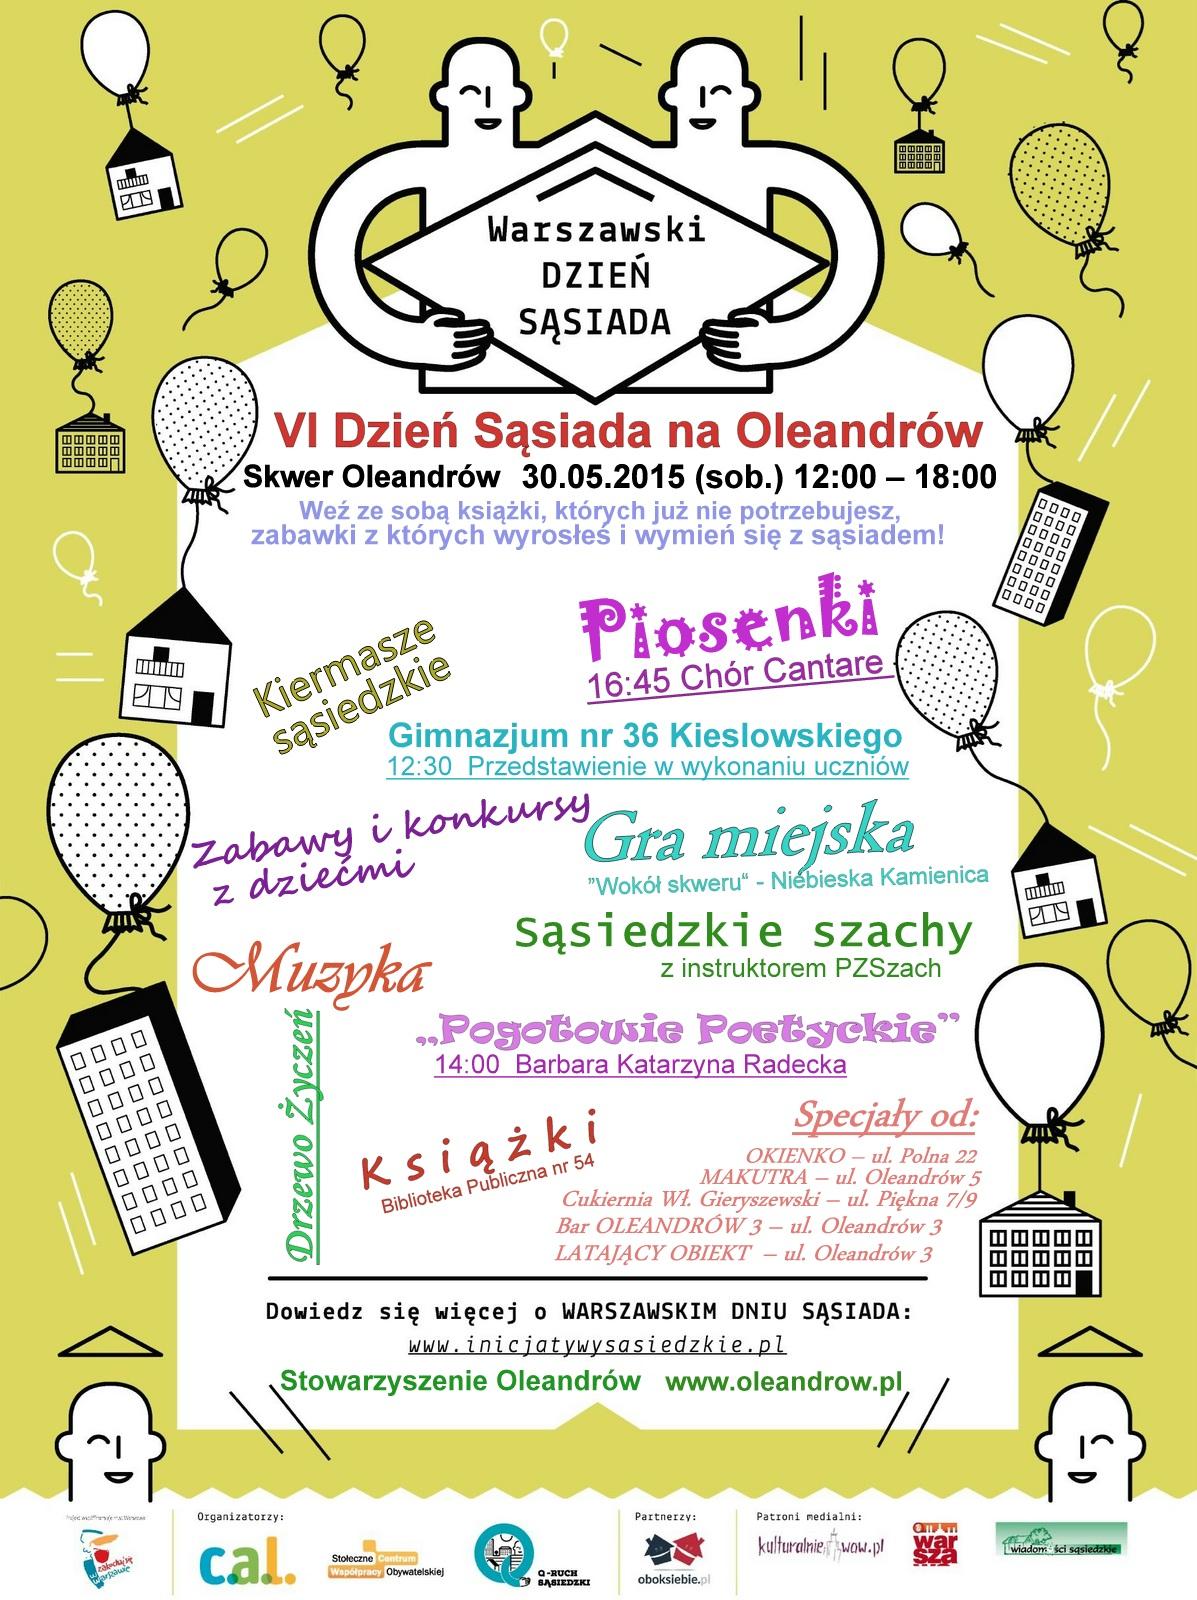 VI DzieńSąsiadaNaOlenadrów_2105-06-30